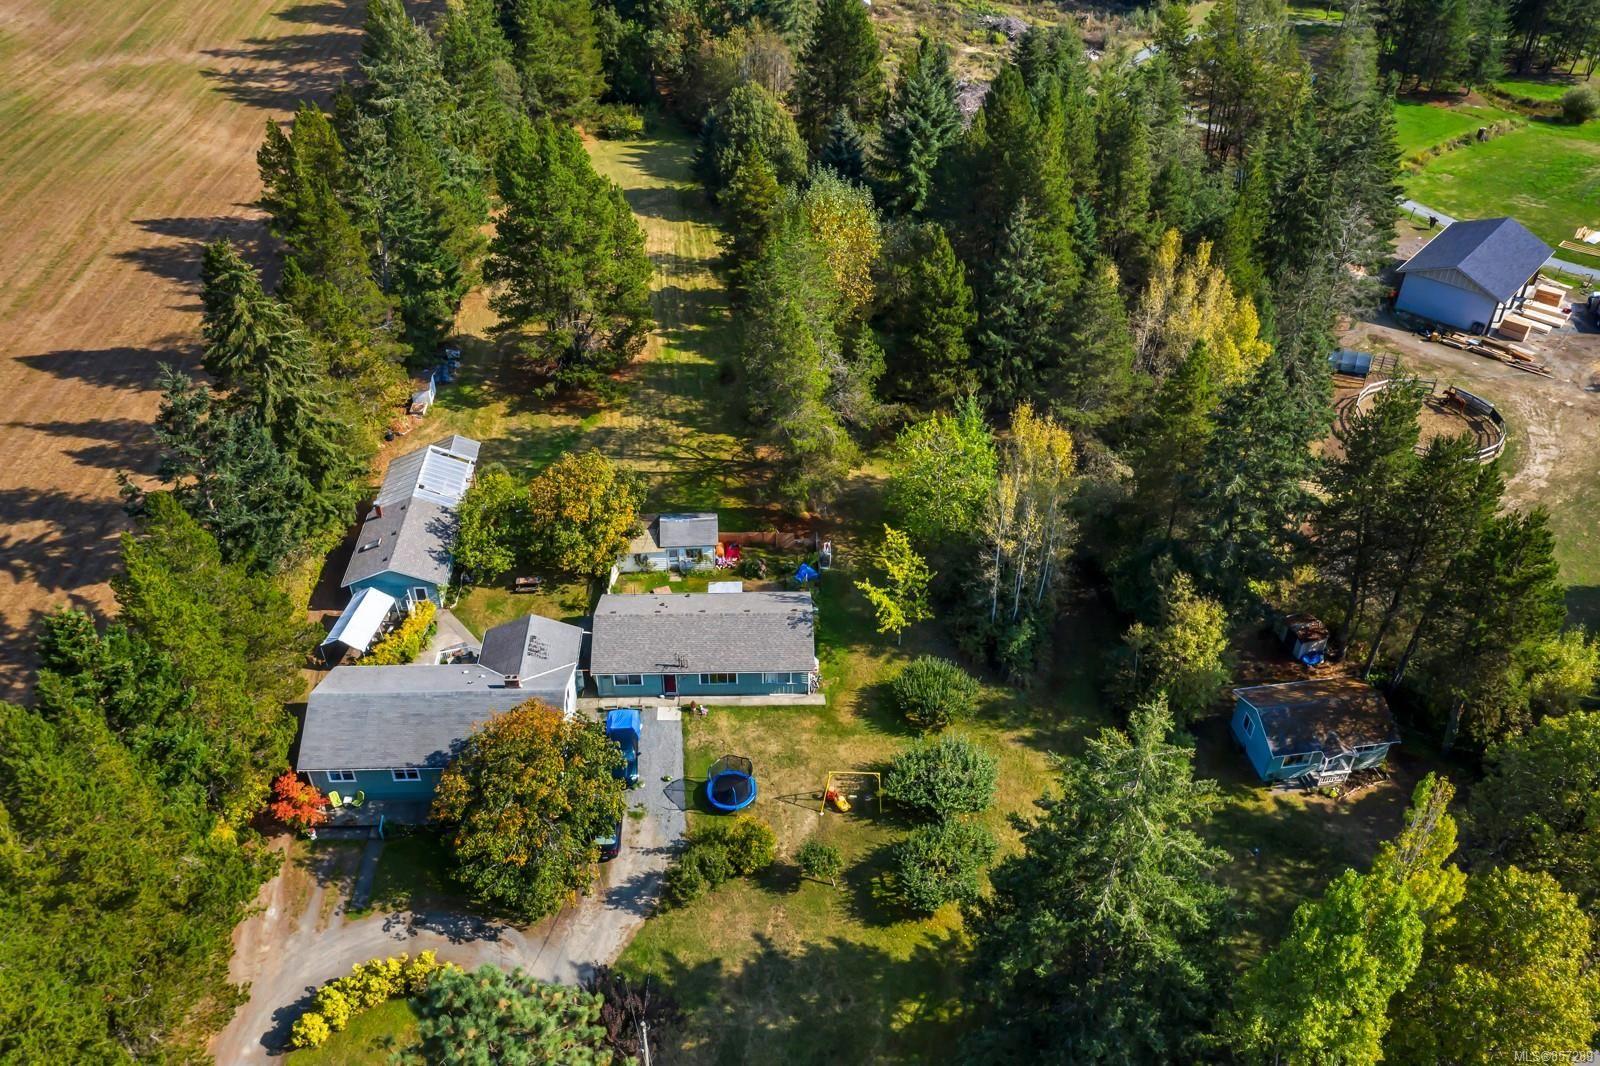 Main Photo: 4441/4445 Telegraph Rd in : Du Cowichan Bay House for sale (Duncan)  : MLS®# 857289